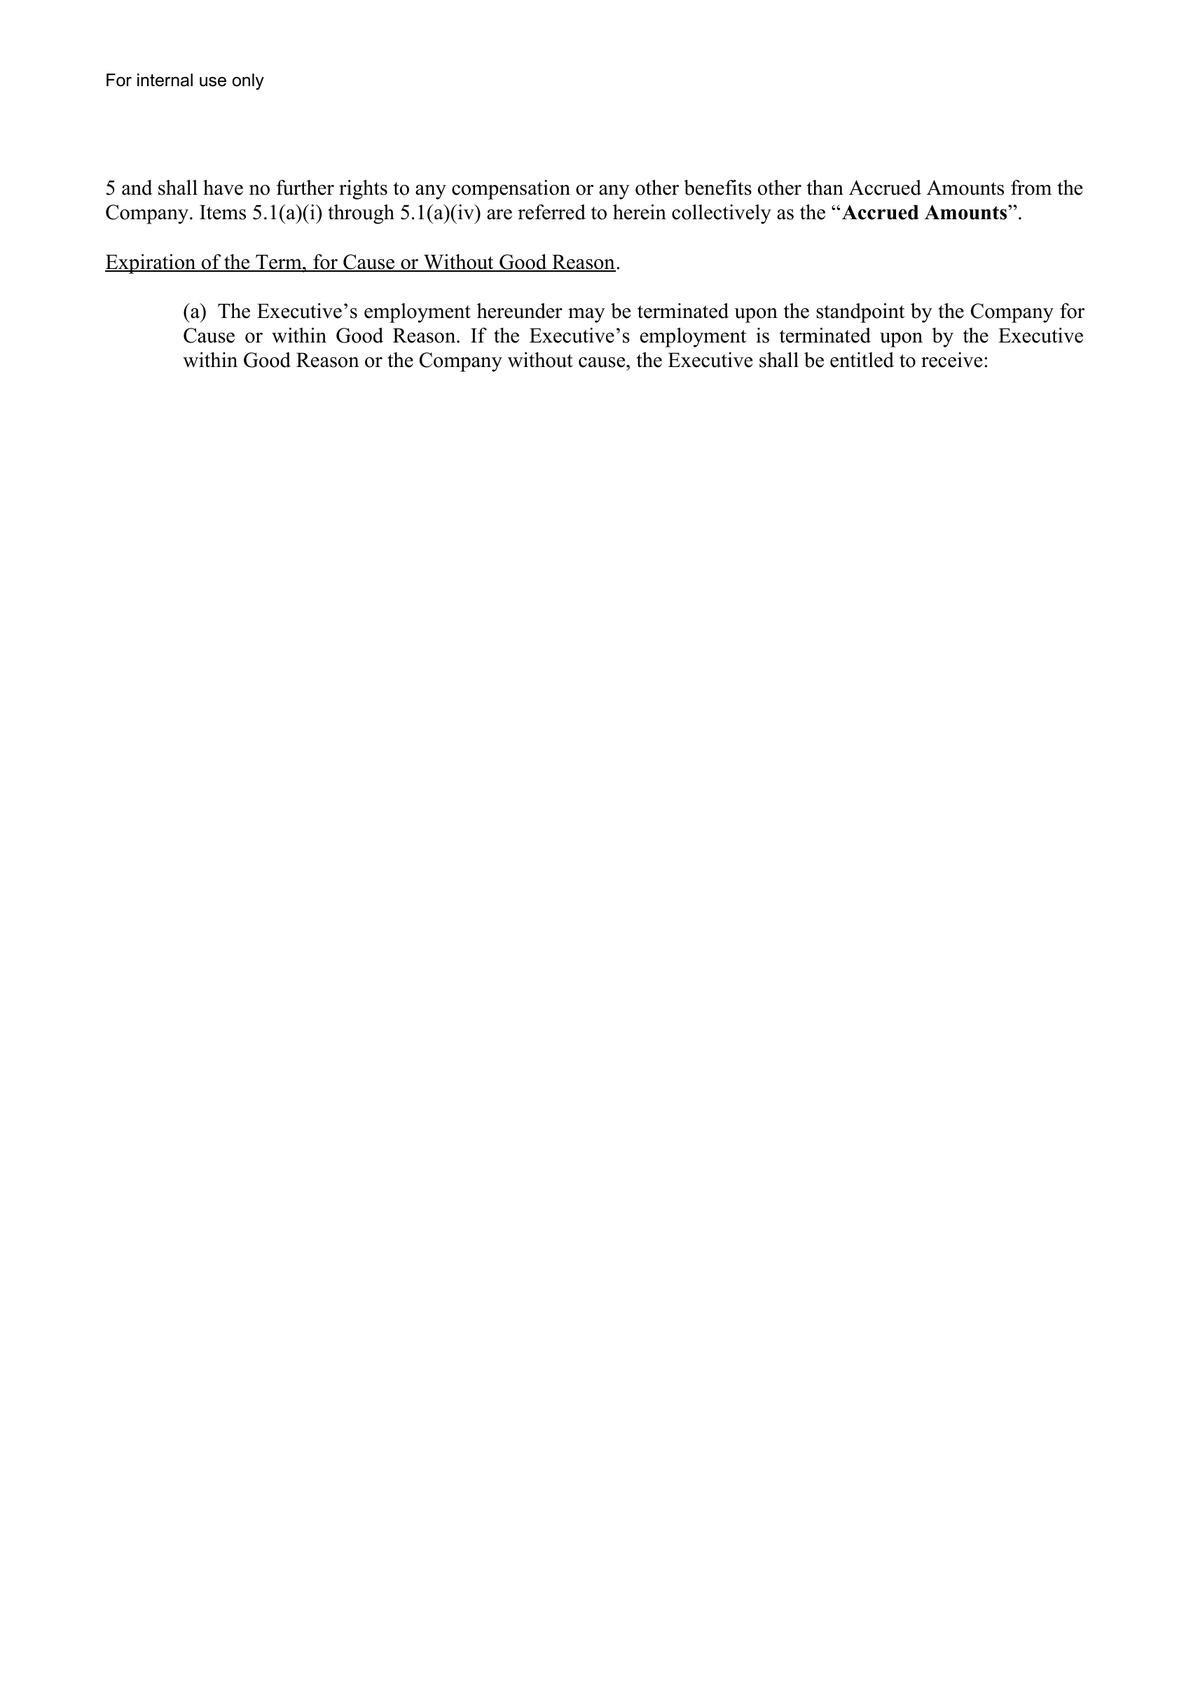 CEO Employment Agreement-2